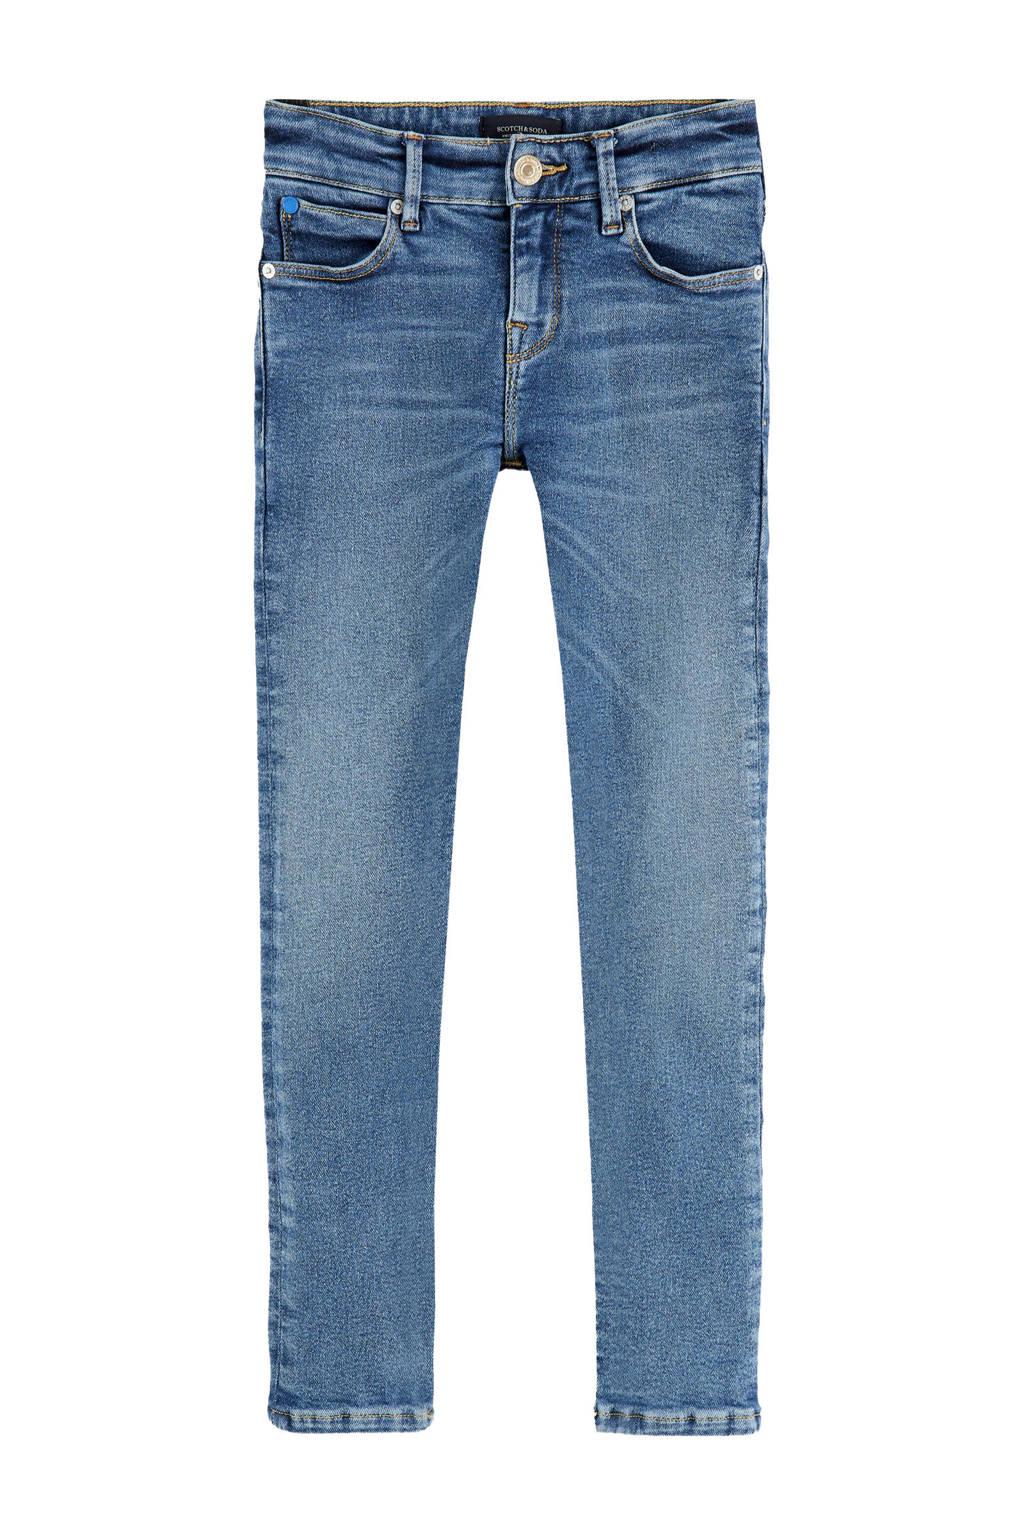 Scotch & Soda slim fit jeans stonewashed, Stonewashed